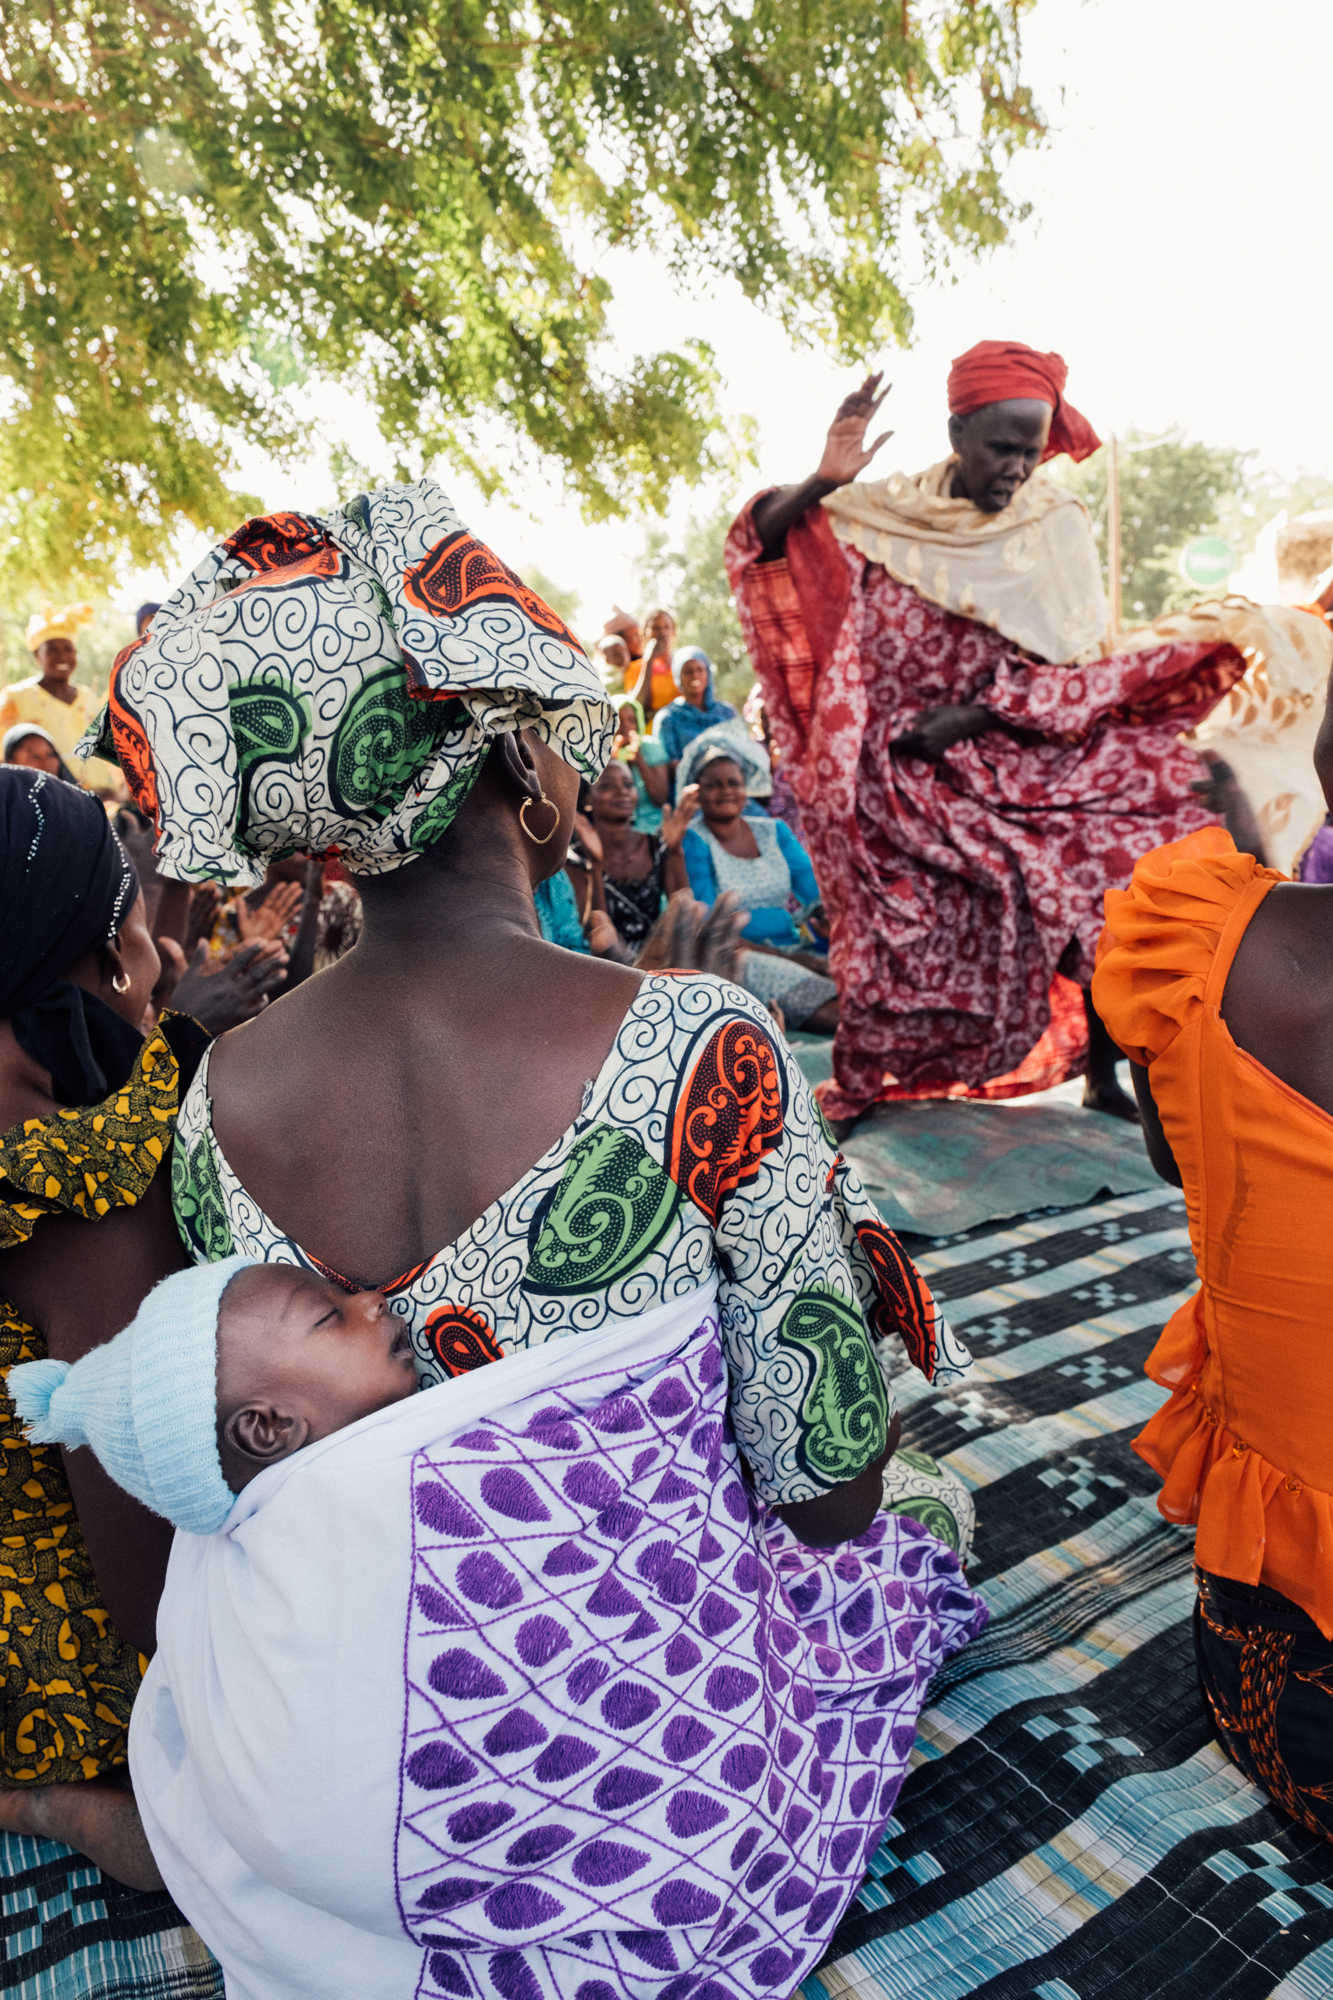 020417_Senegal_Day_2-118.jpg